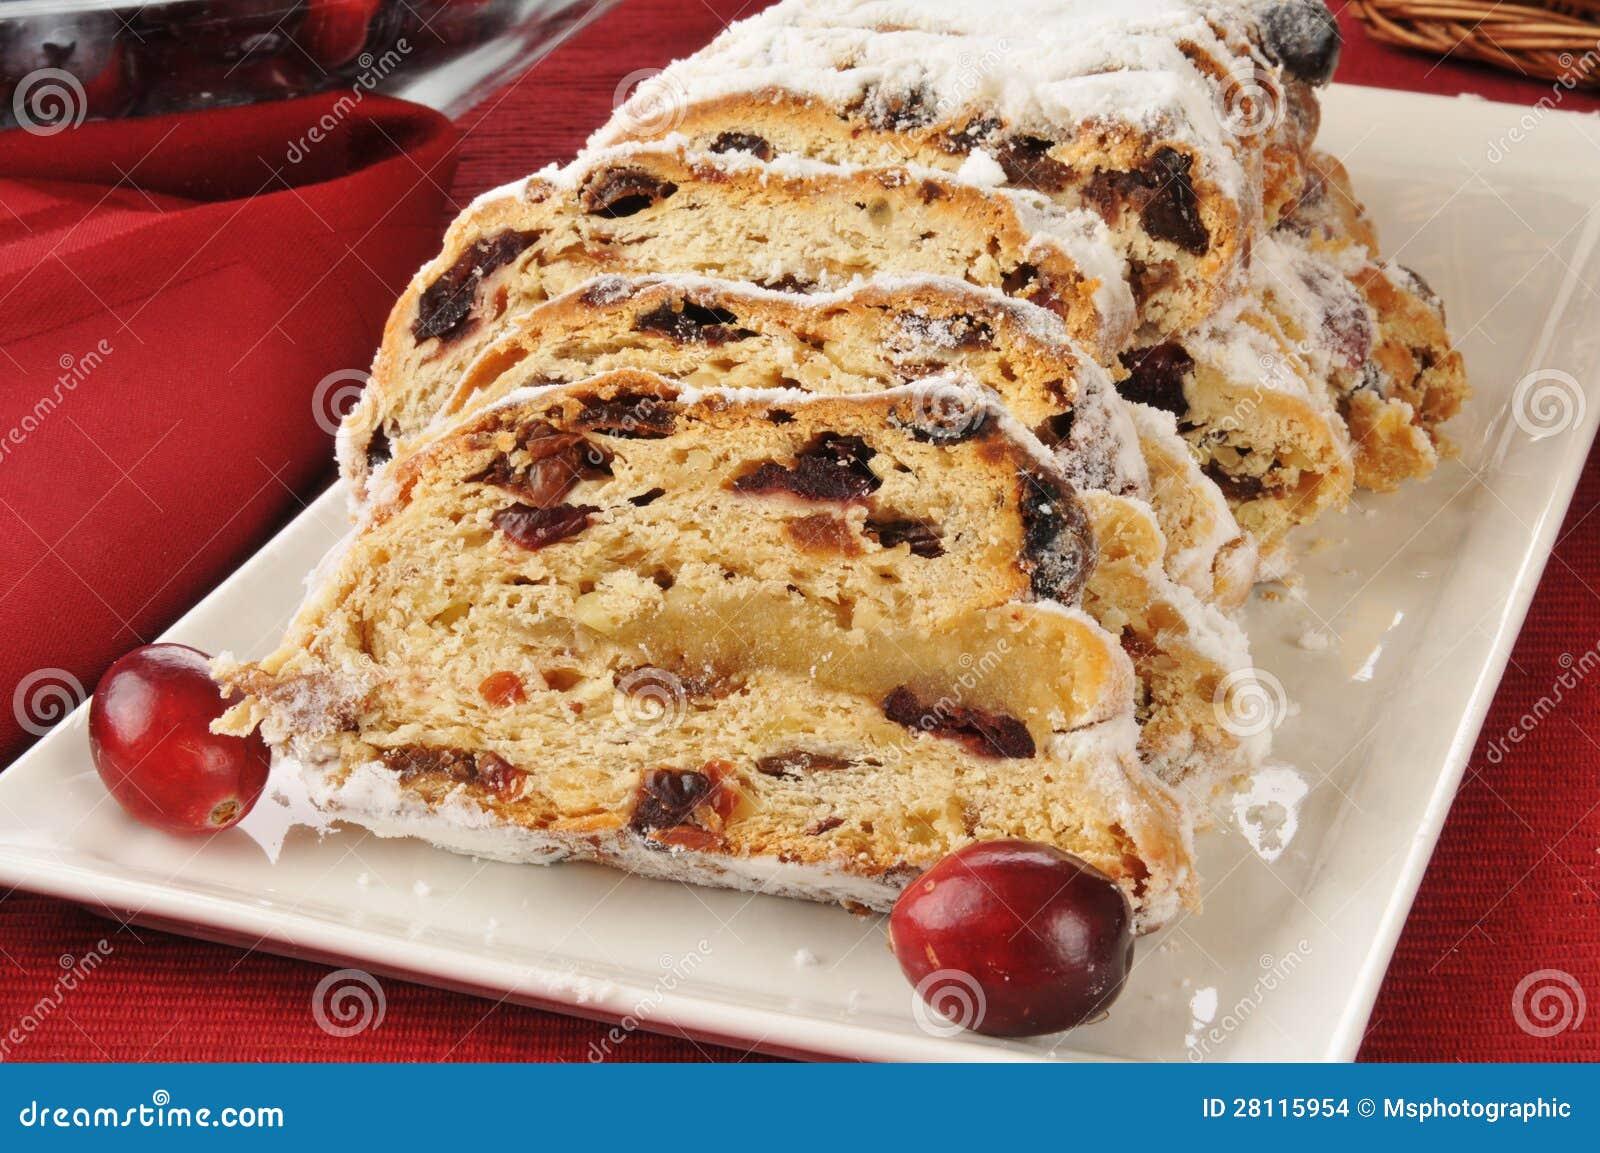 German Christmas Fruit Cake Stock Images - Image: 28115954